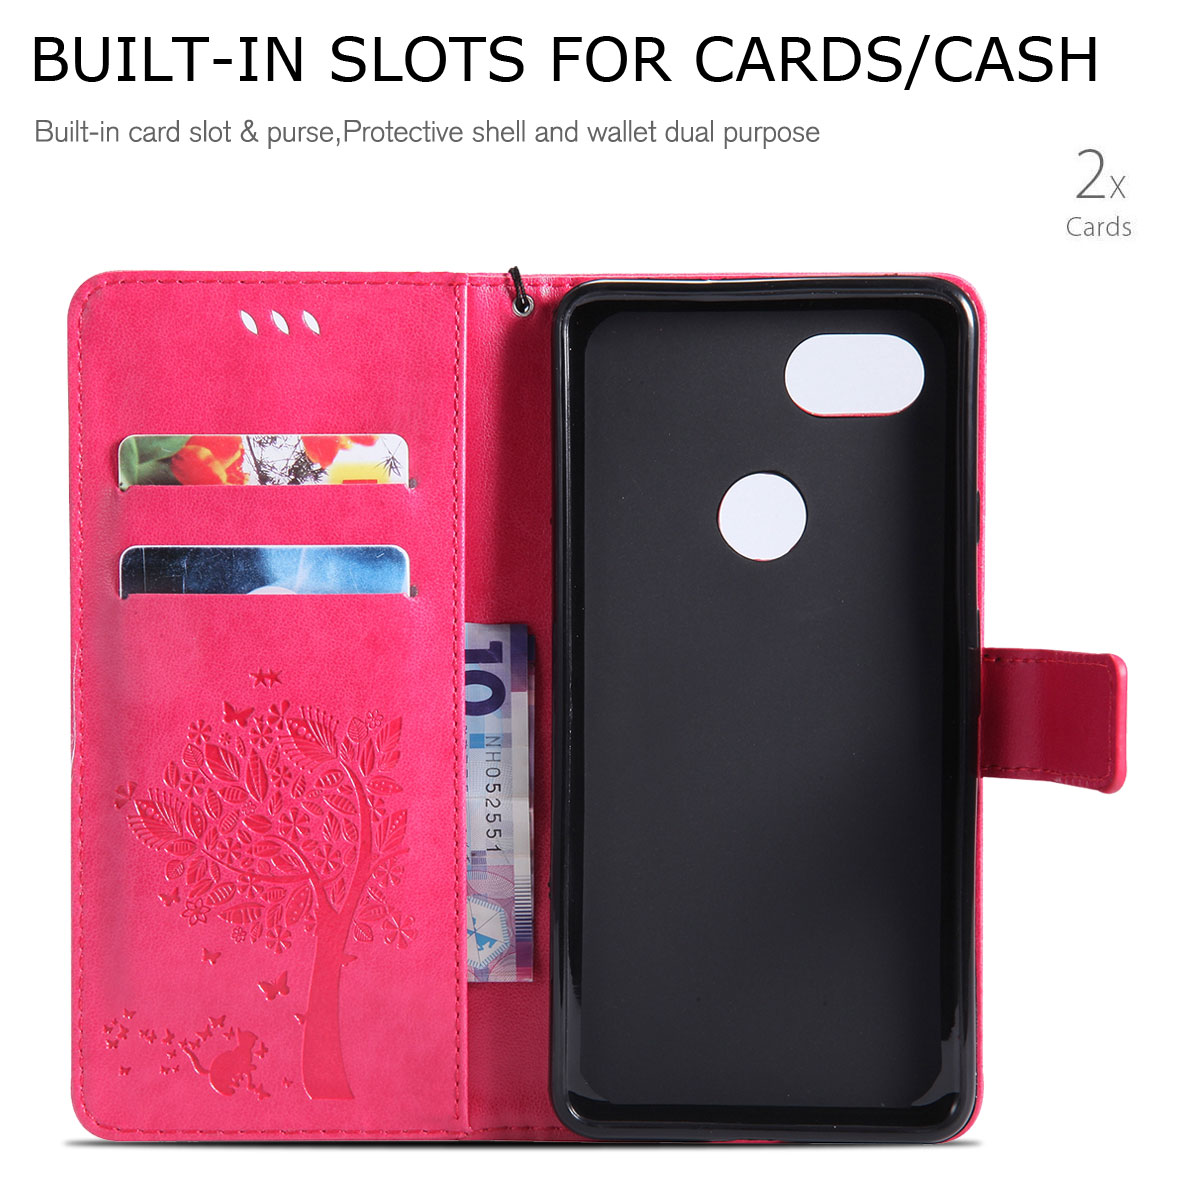 Magnetic-Leather-Credit-Card-Holder-Flip-Case-Cover-For-Google-Pixel-2-2-XL thumbnail 41